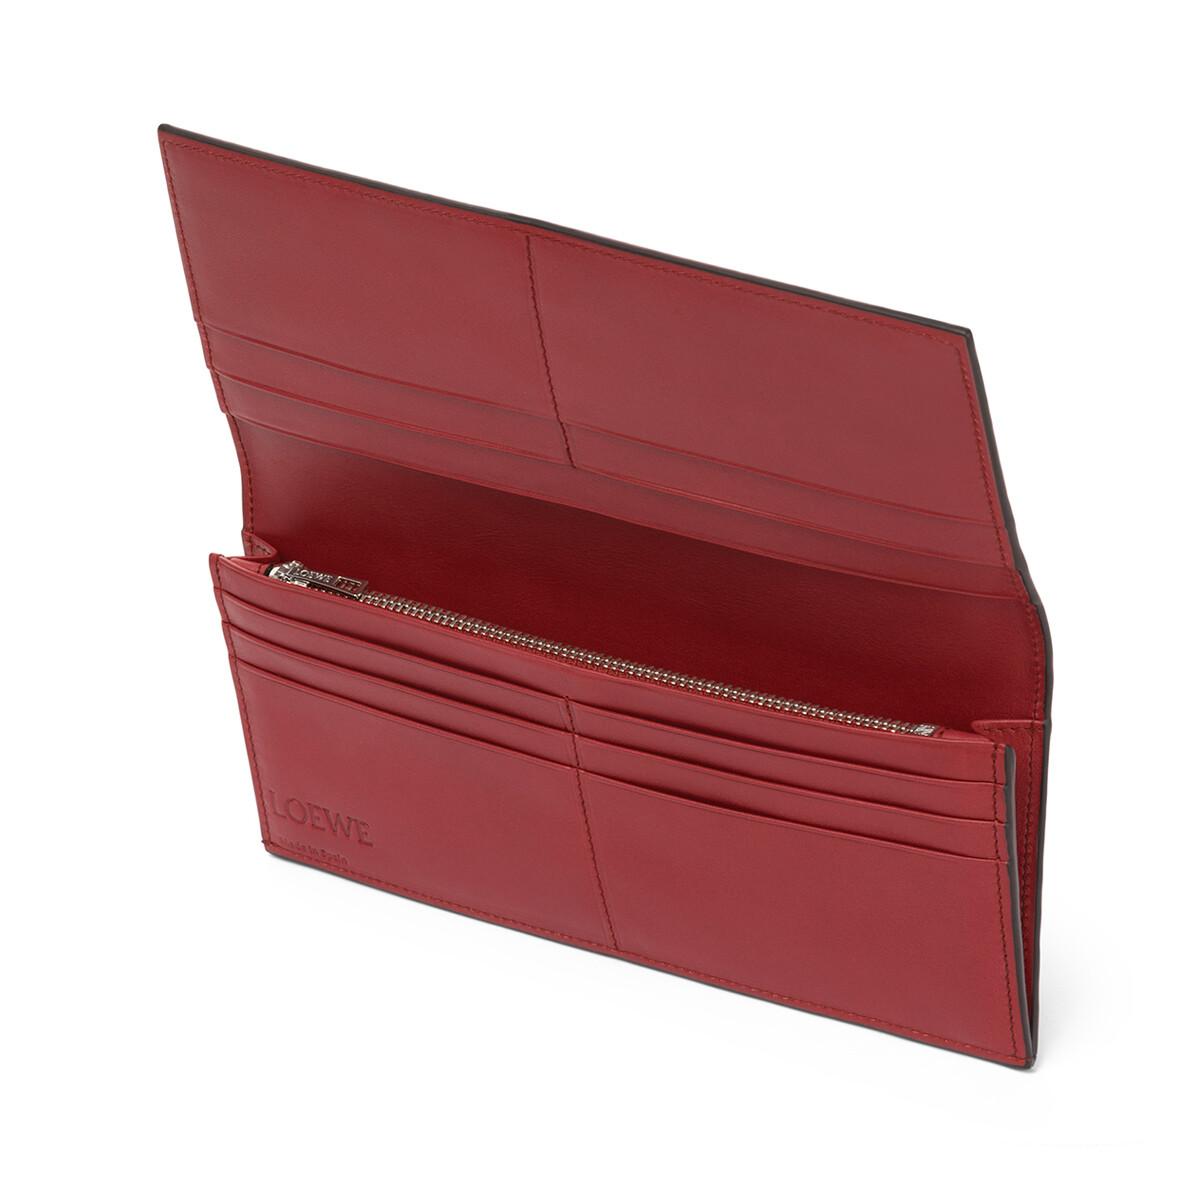 LOEWE Long Horizontal Wallet Marine/Brick Red front